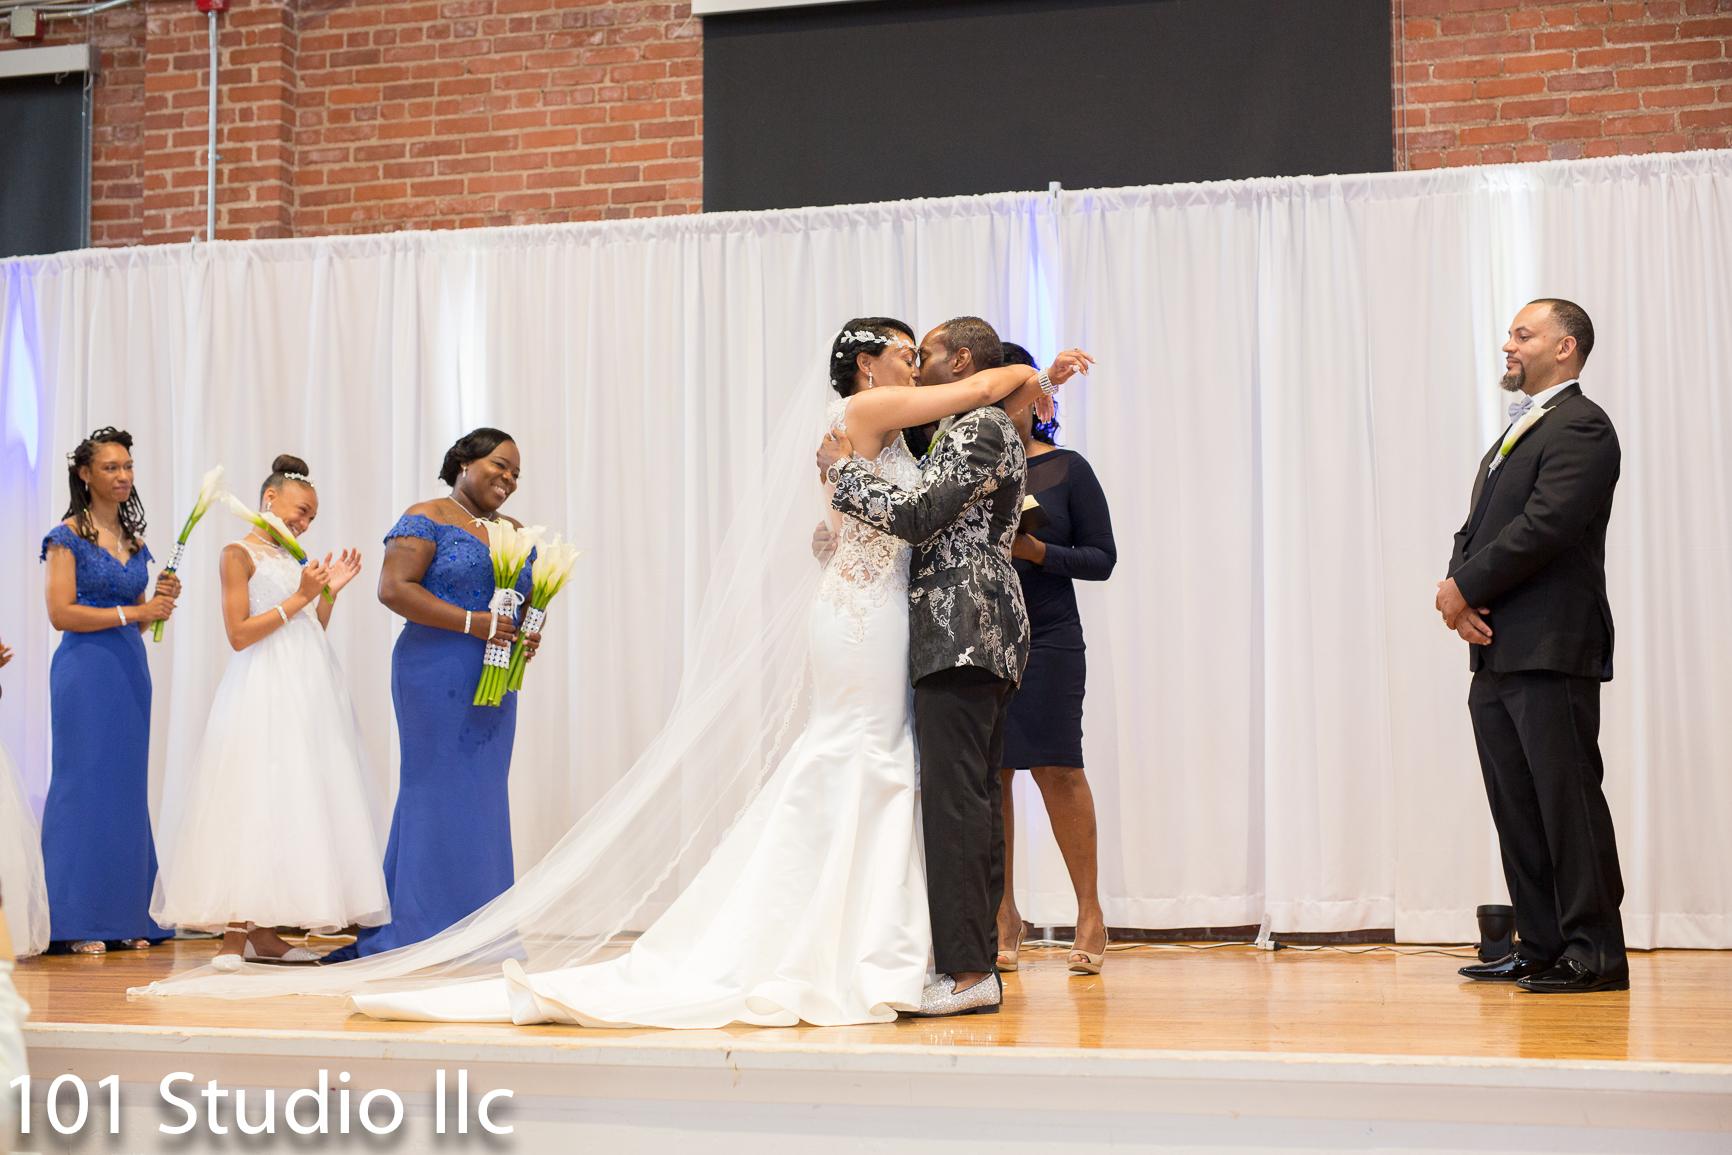 Raleigh  wedding photographer - 101 Studio llc -8.jpg